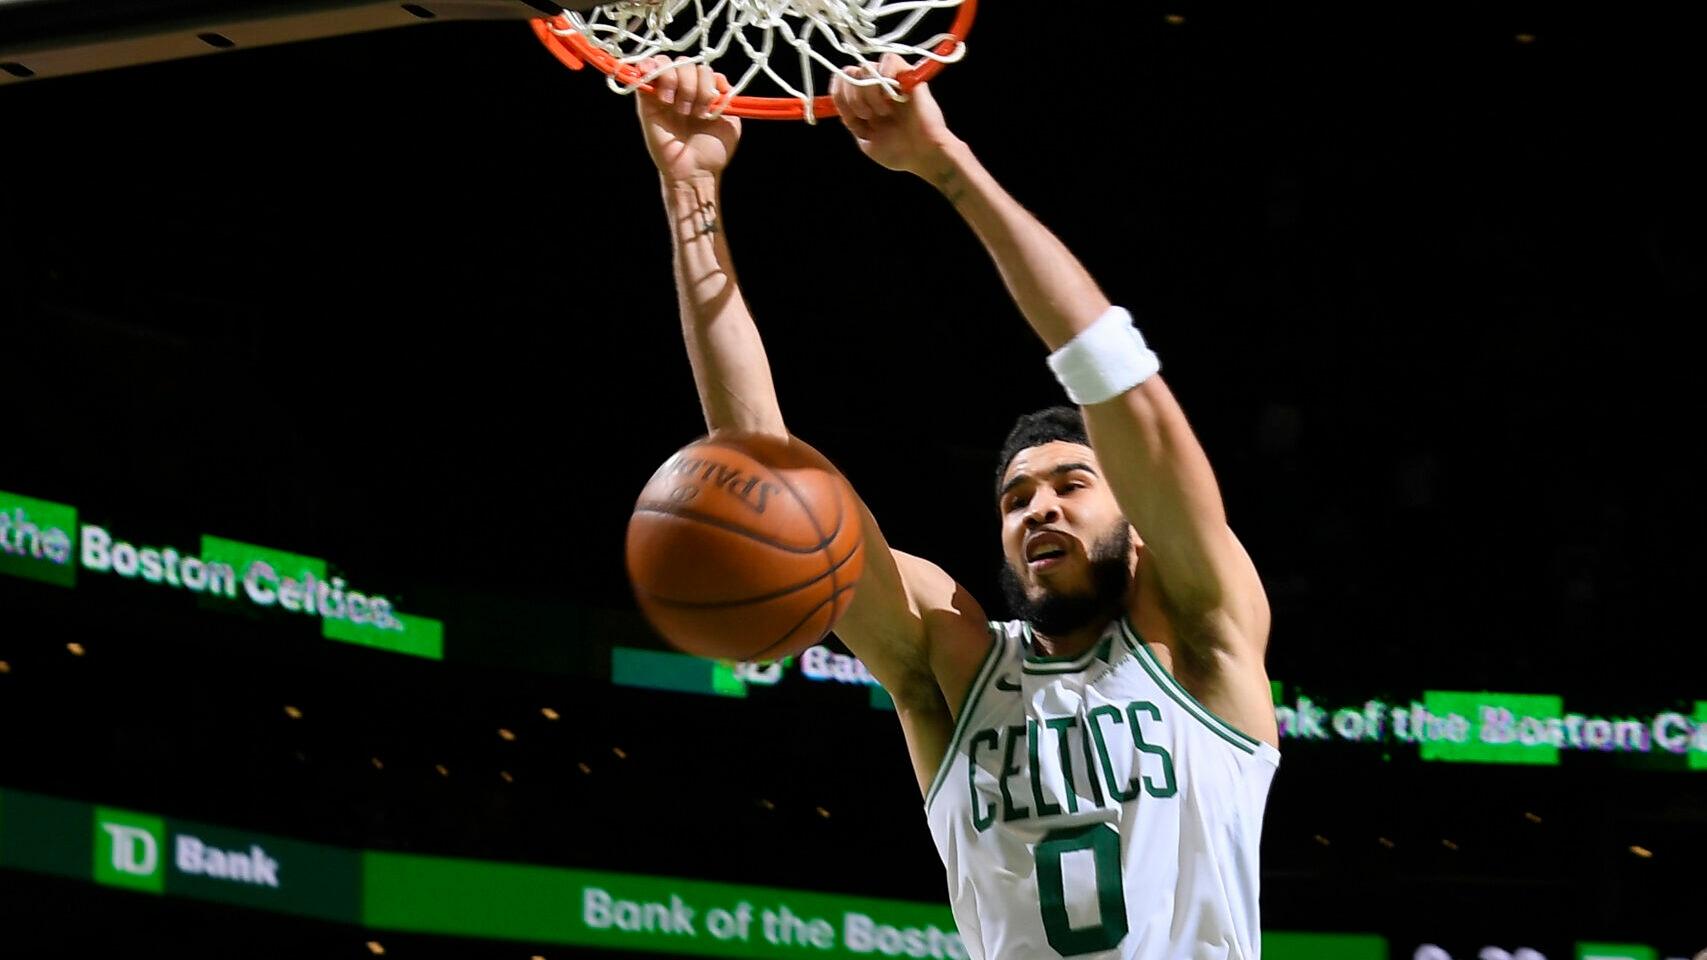 Jayson Tatum ties Celtics scoring record, leads comeback from 32 points down